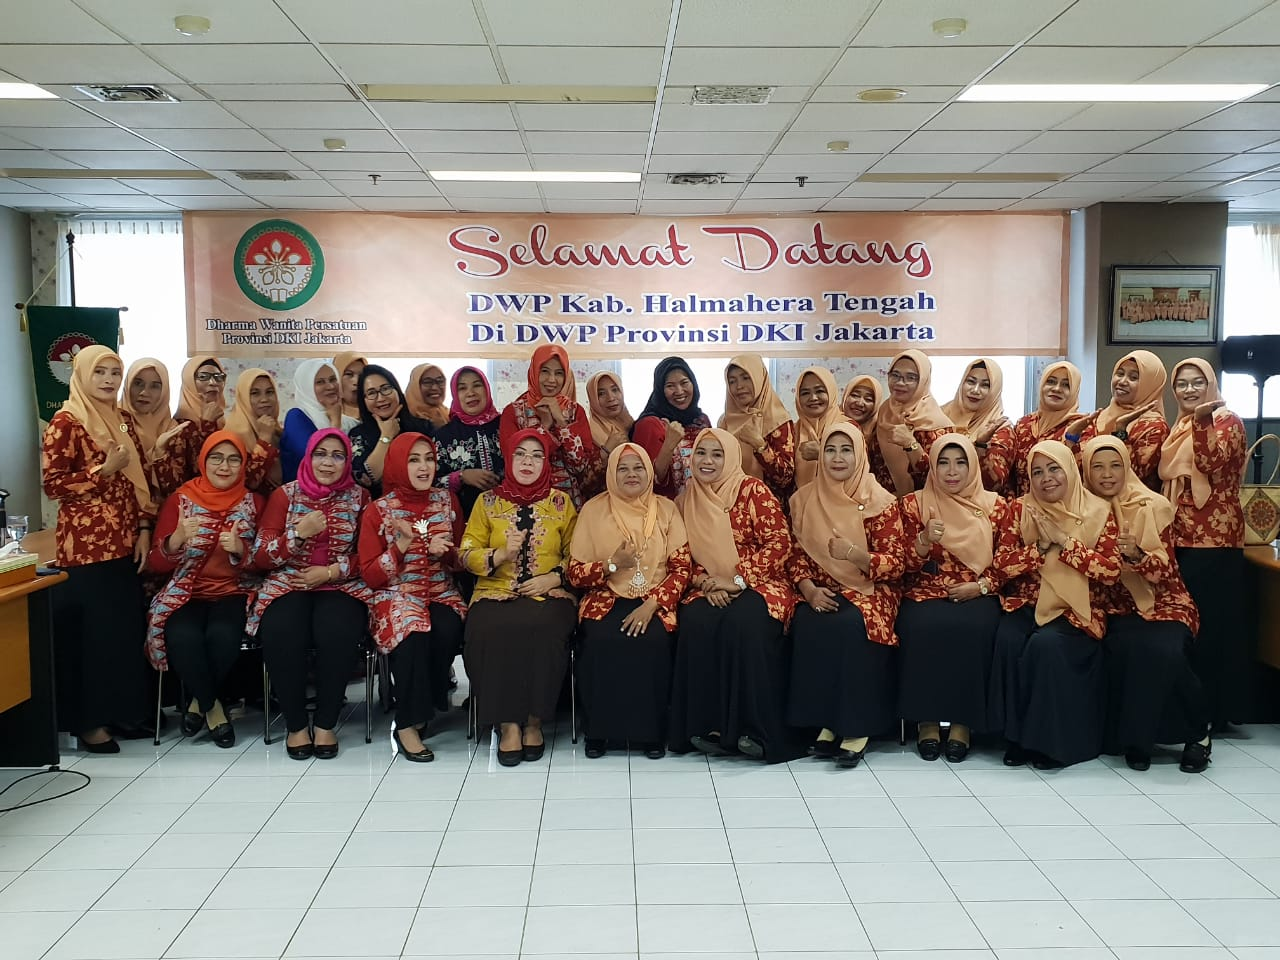 Kunjungan DWP Kab. Halmahera Tengah